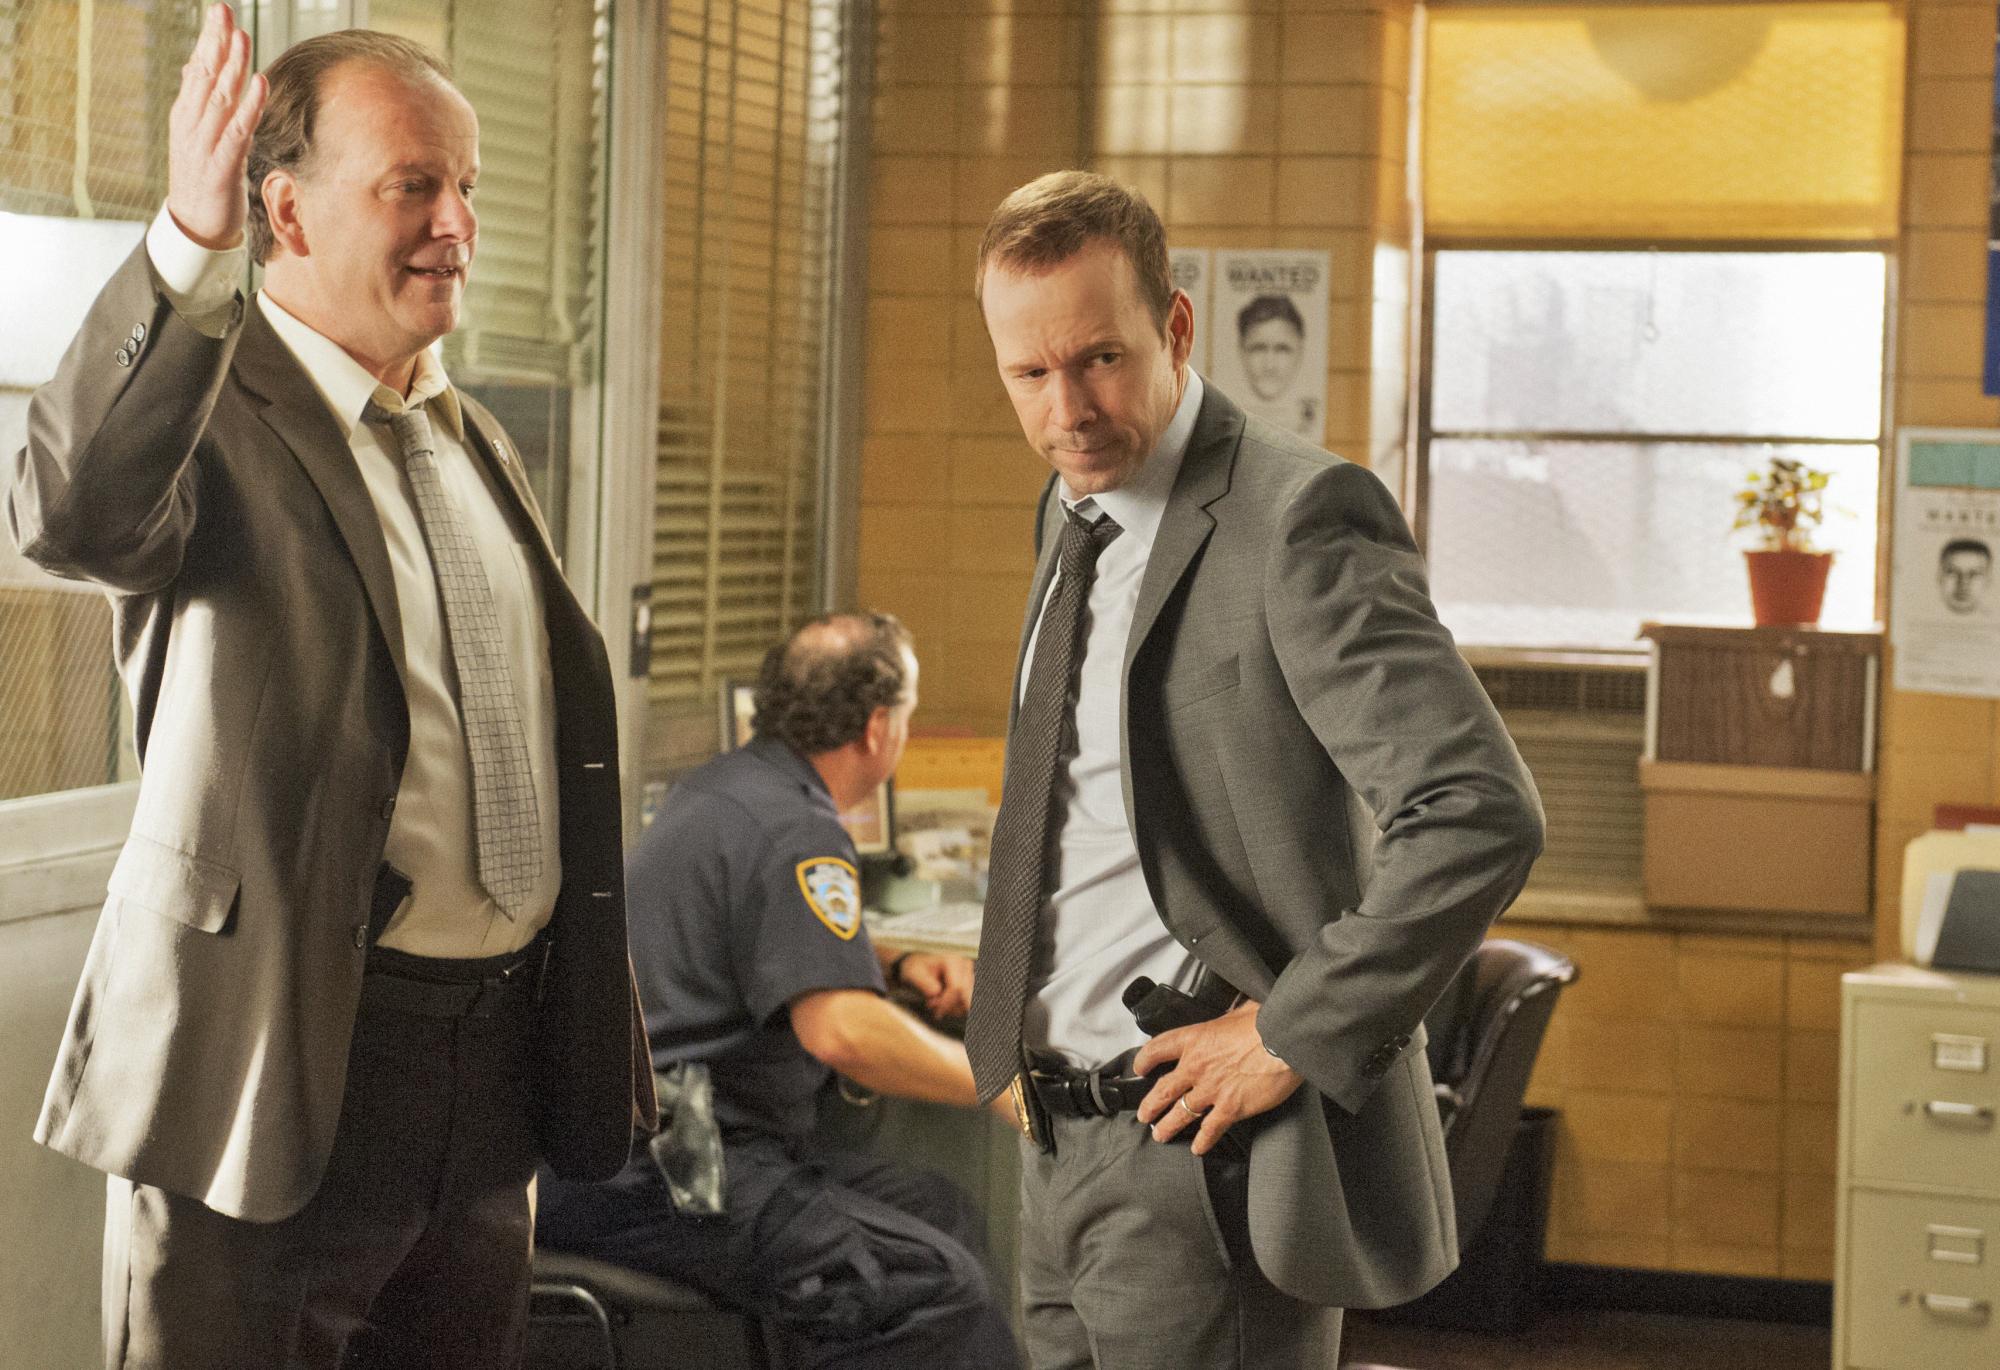 Sergeant Gormley and Danny Discuss a Murder Case